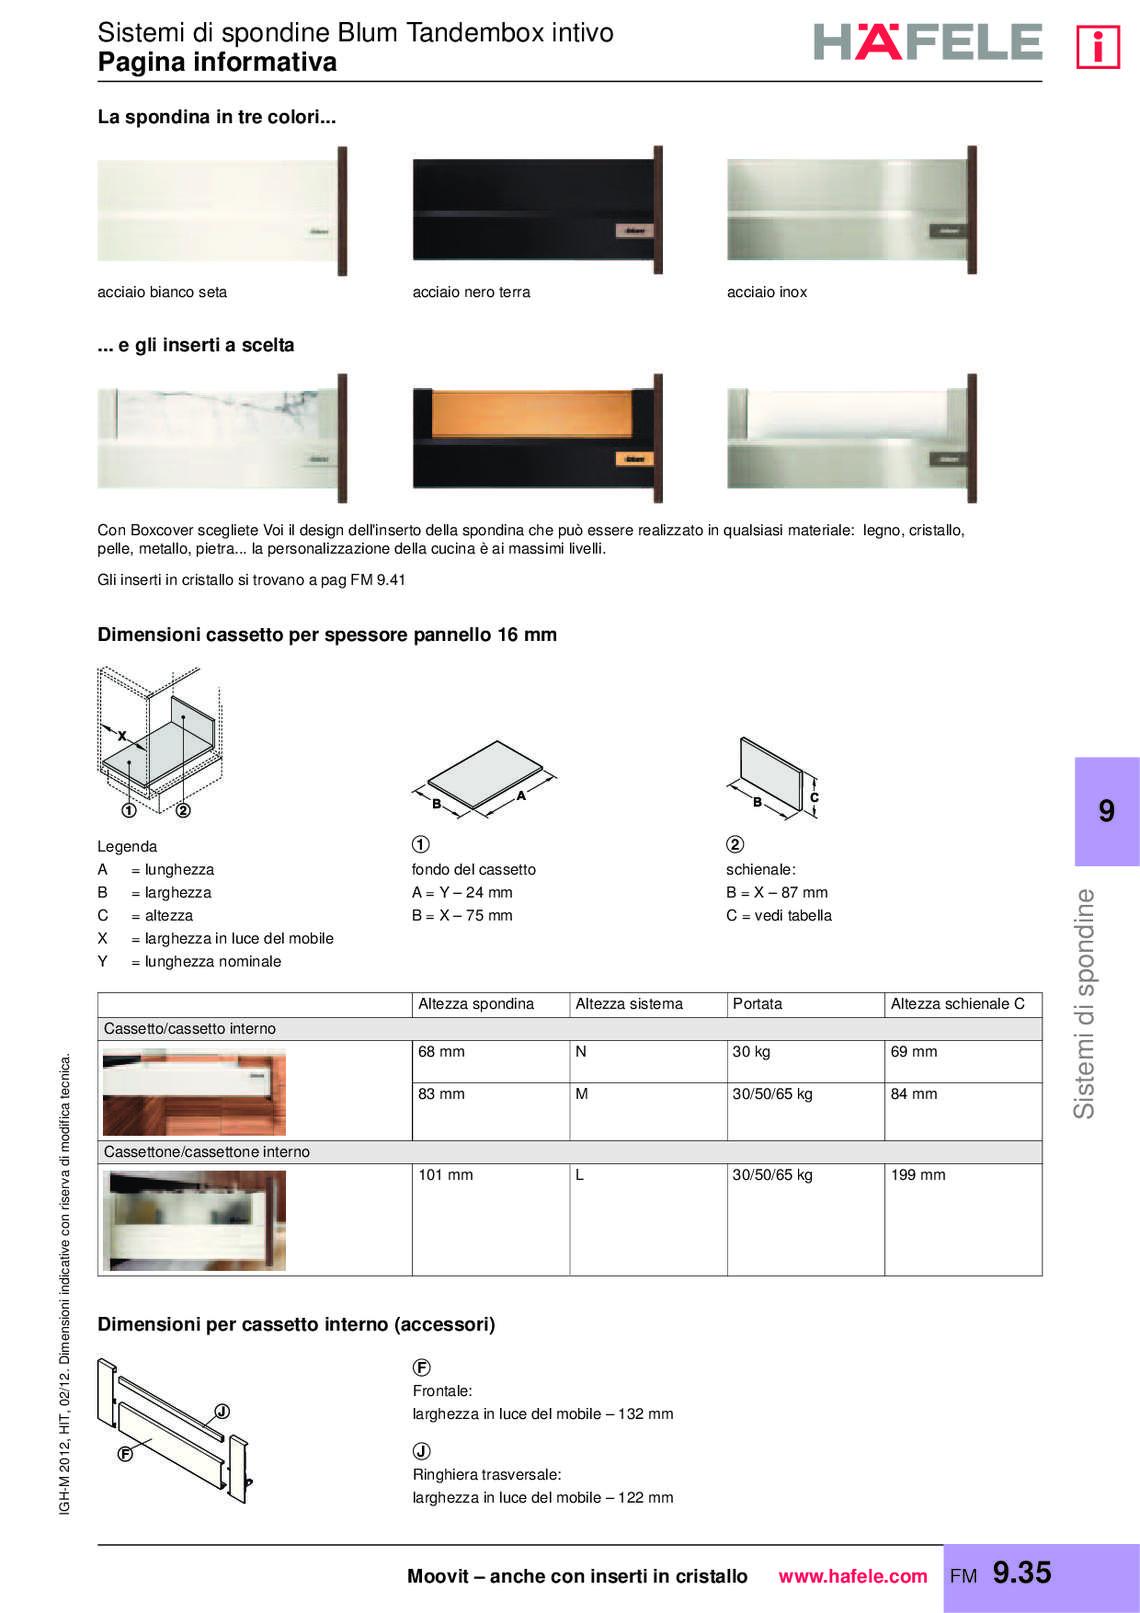 hafele-spondine-e-guide-per-mobili_40_048.jpg